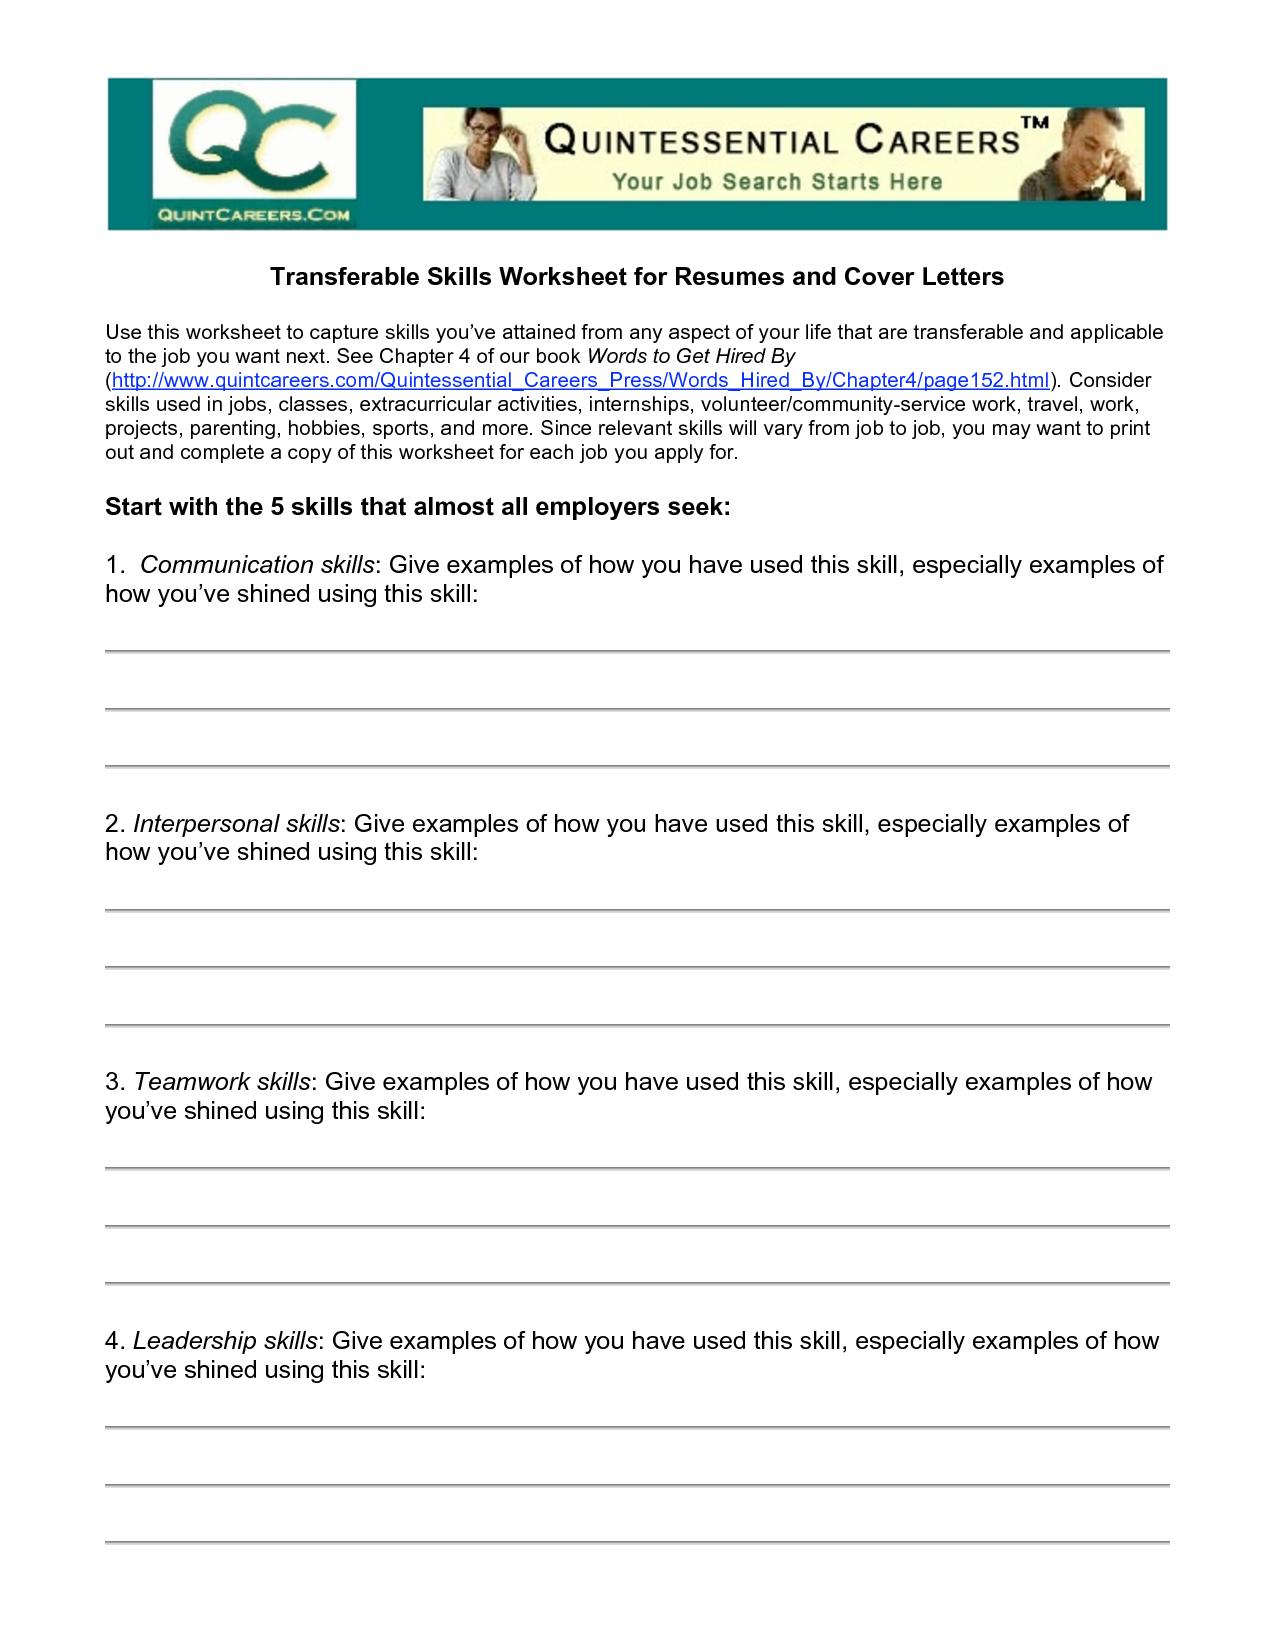 Worksheets Transferable Skills Worksheet skills worksheet delibertad transferable delibertad